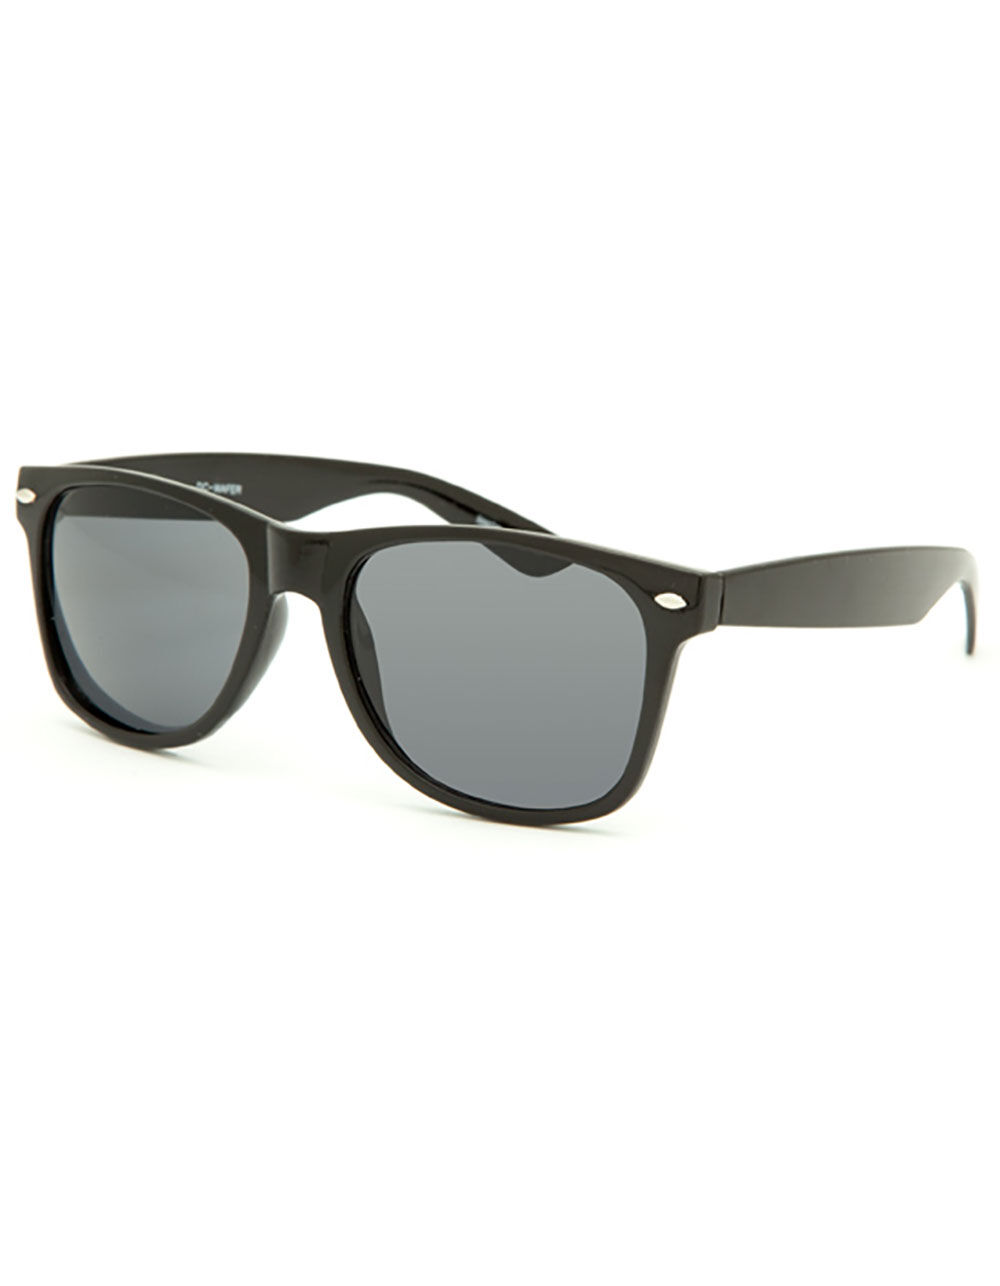 BLUE CROWN Buddy Sunglasses